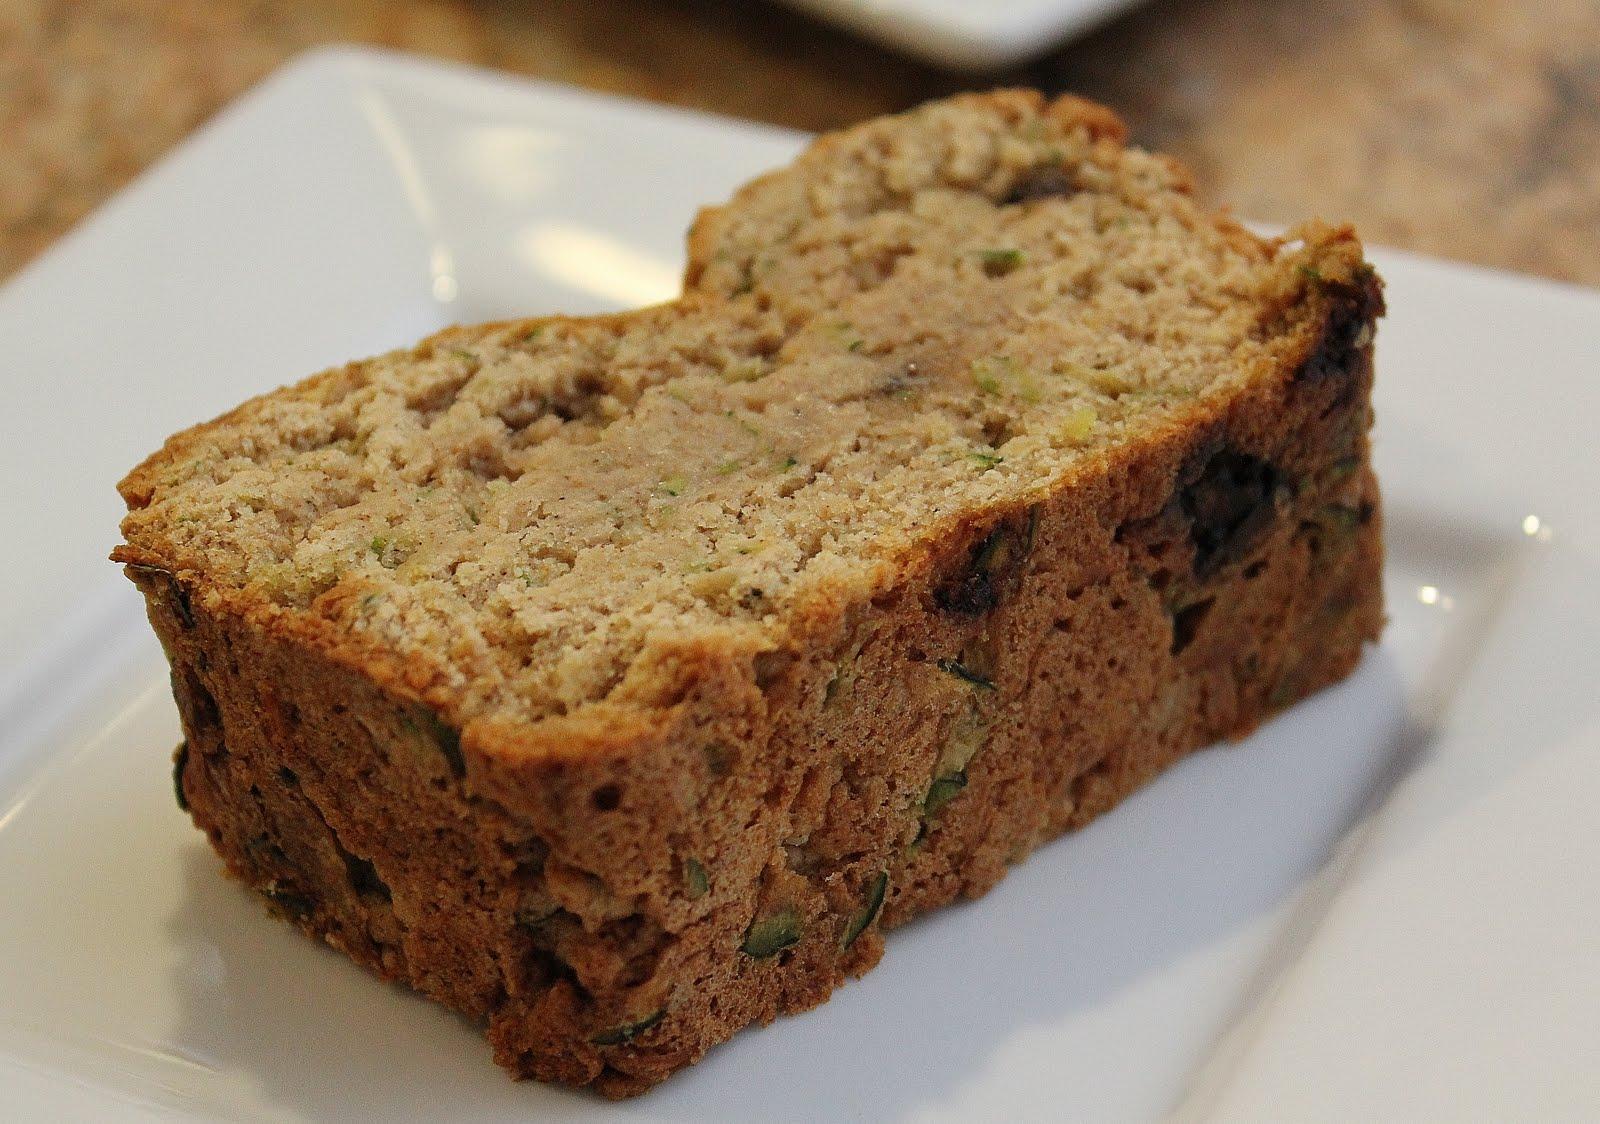 ... On The Vedge: Chocolate Chip Zucchini Bread, Vegan and Gluten Free